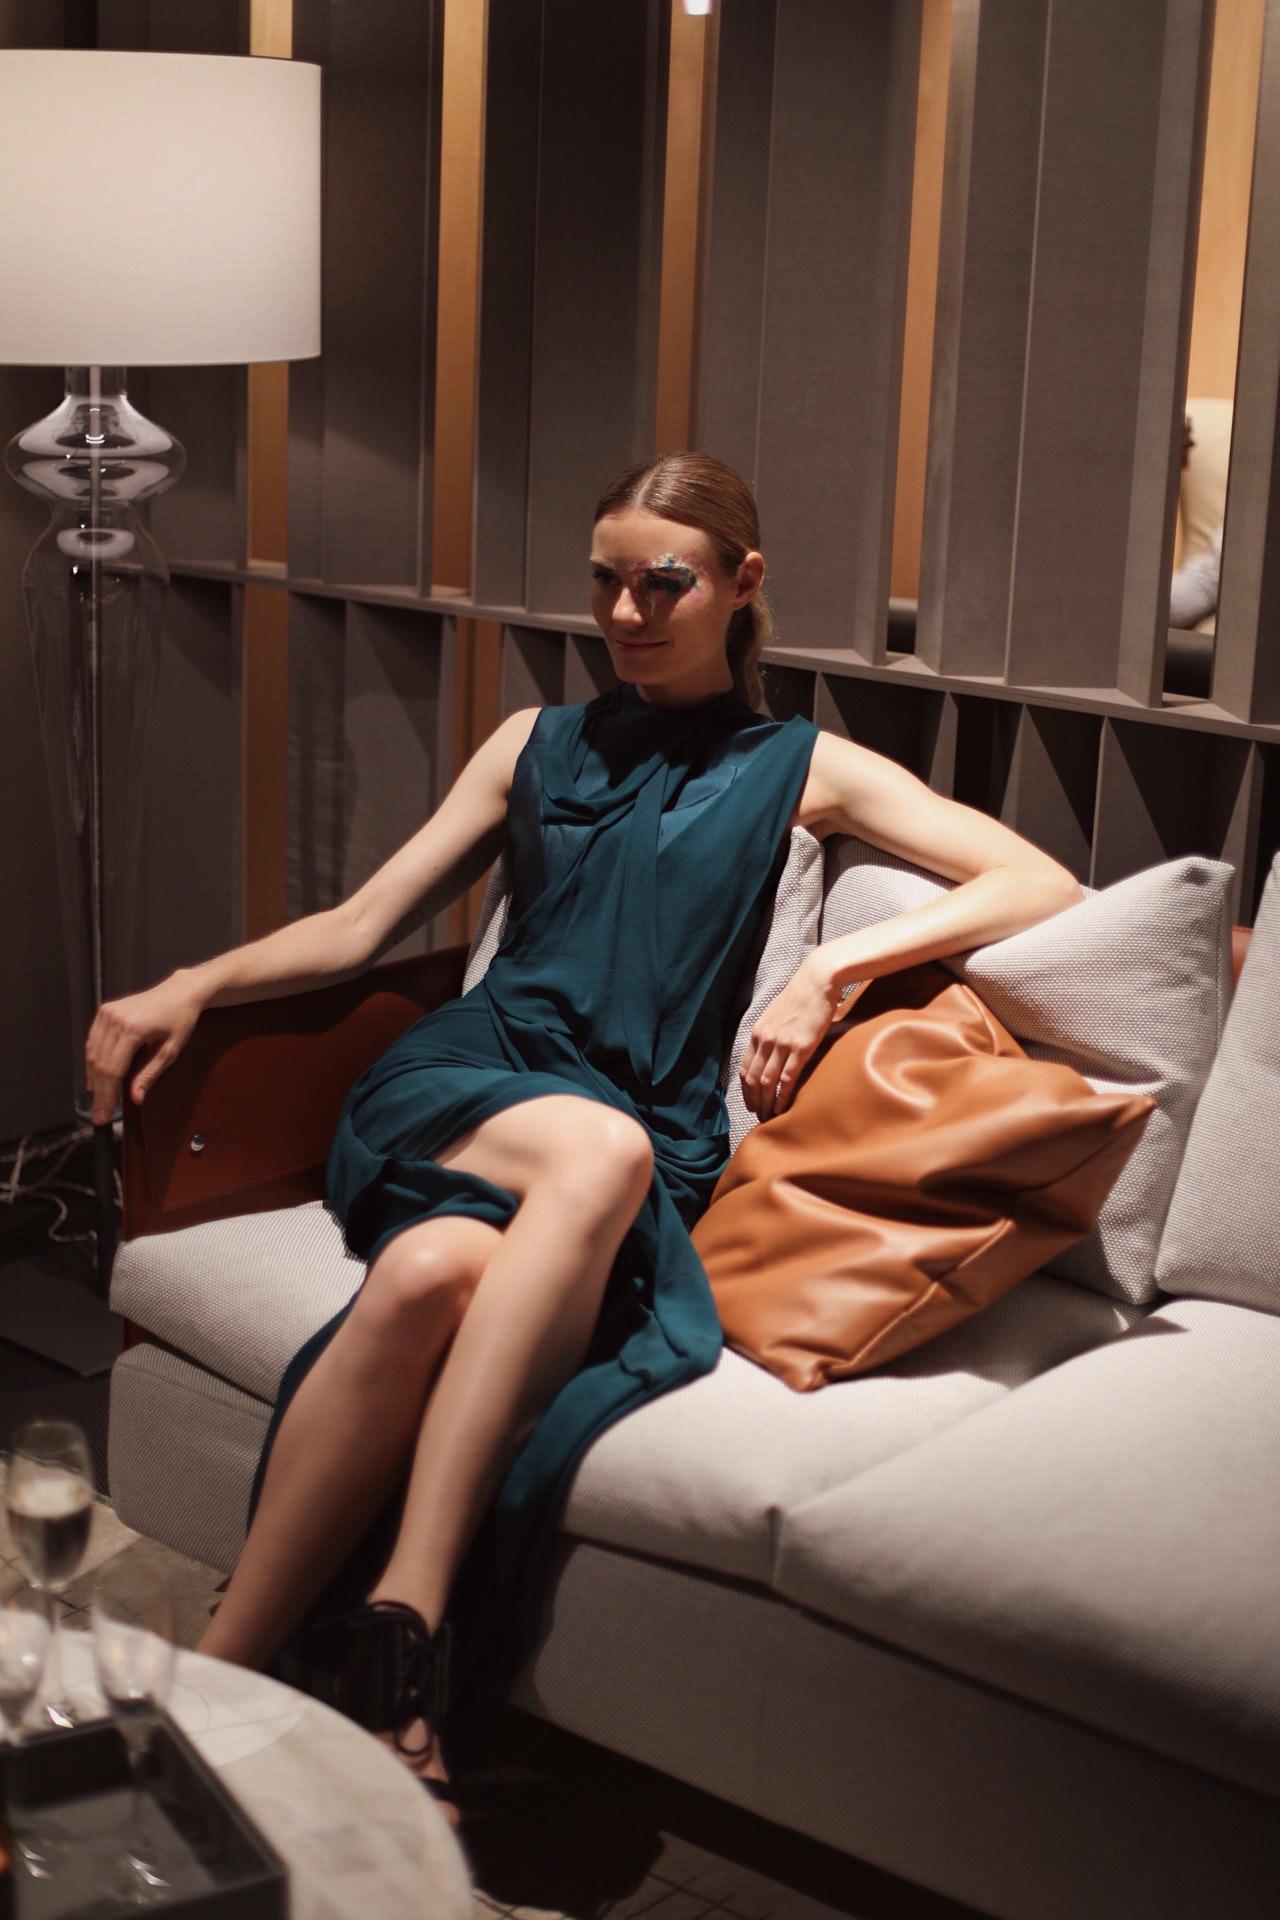 model at the Mobilia Perth furniture and design store